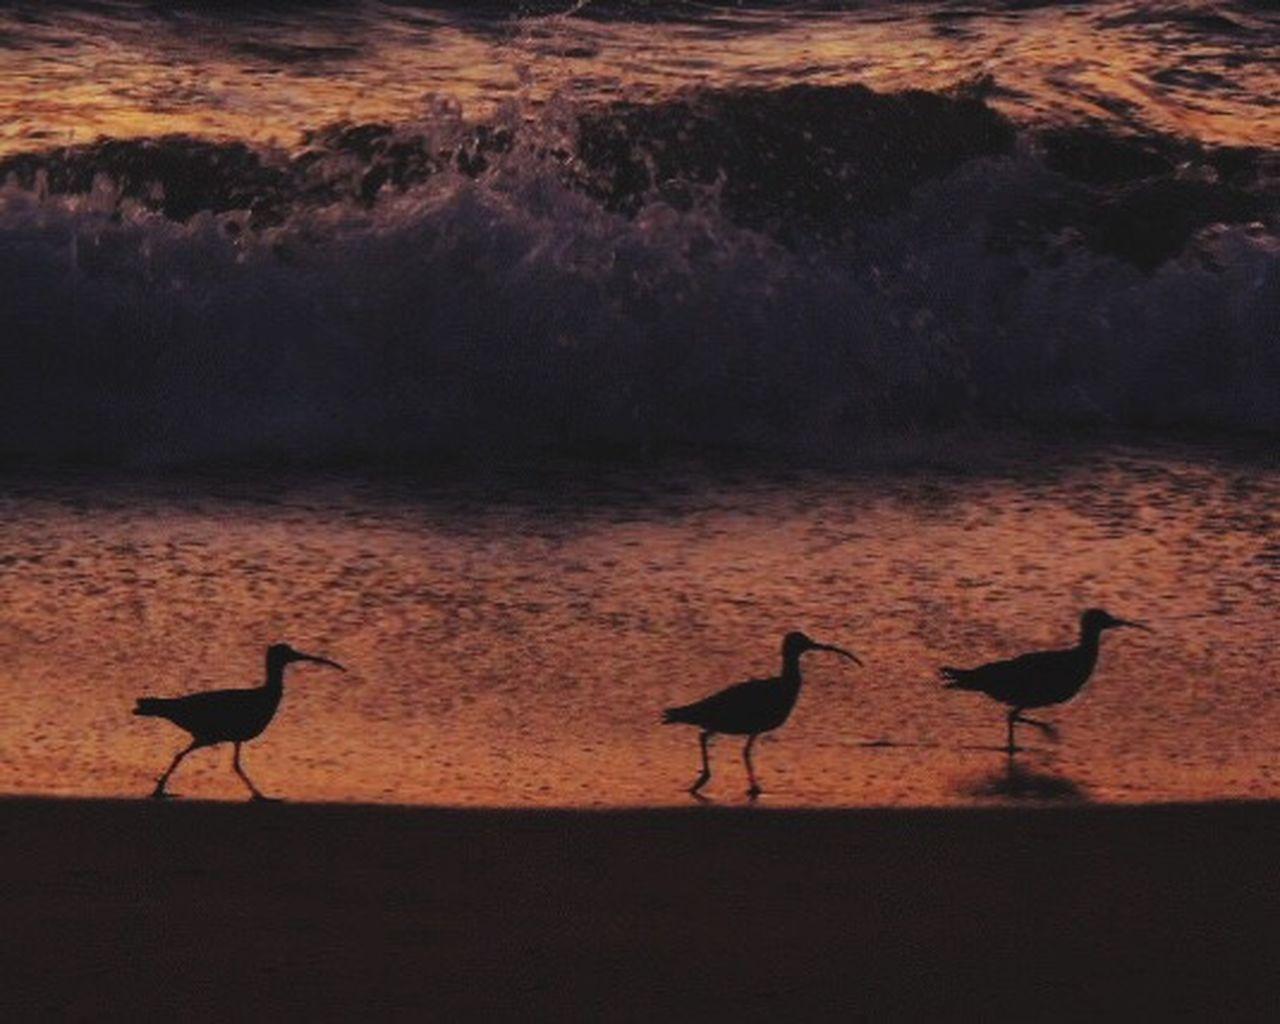 animals in the wild, bird, animal wildlife, animal themes, sunset, two animals, silhouette, no people, outdoors, nature, water, scenics, travel destinations, night, flamingo, ibis, mammal